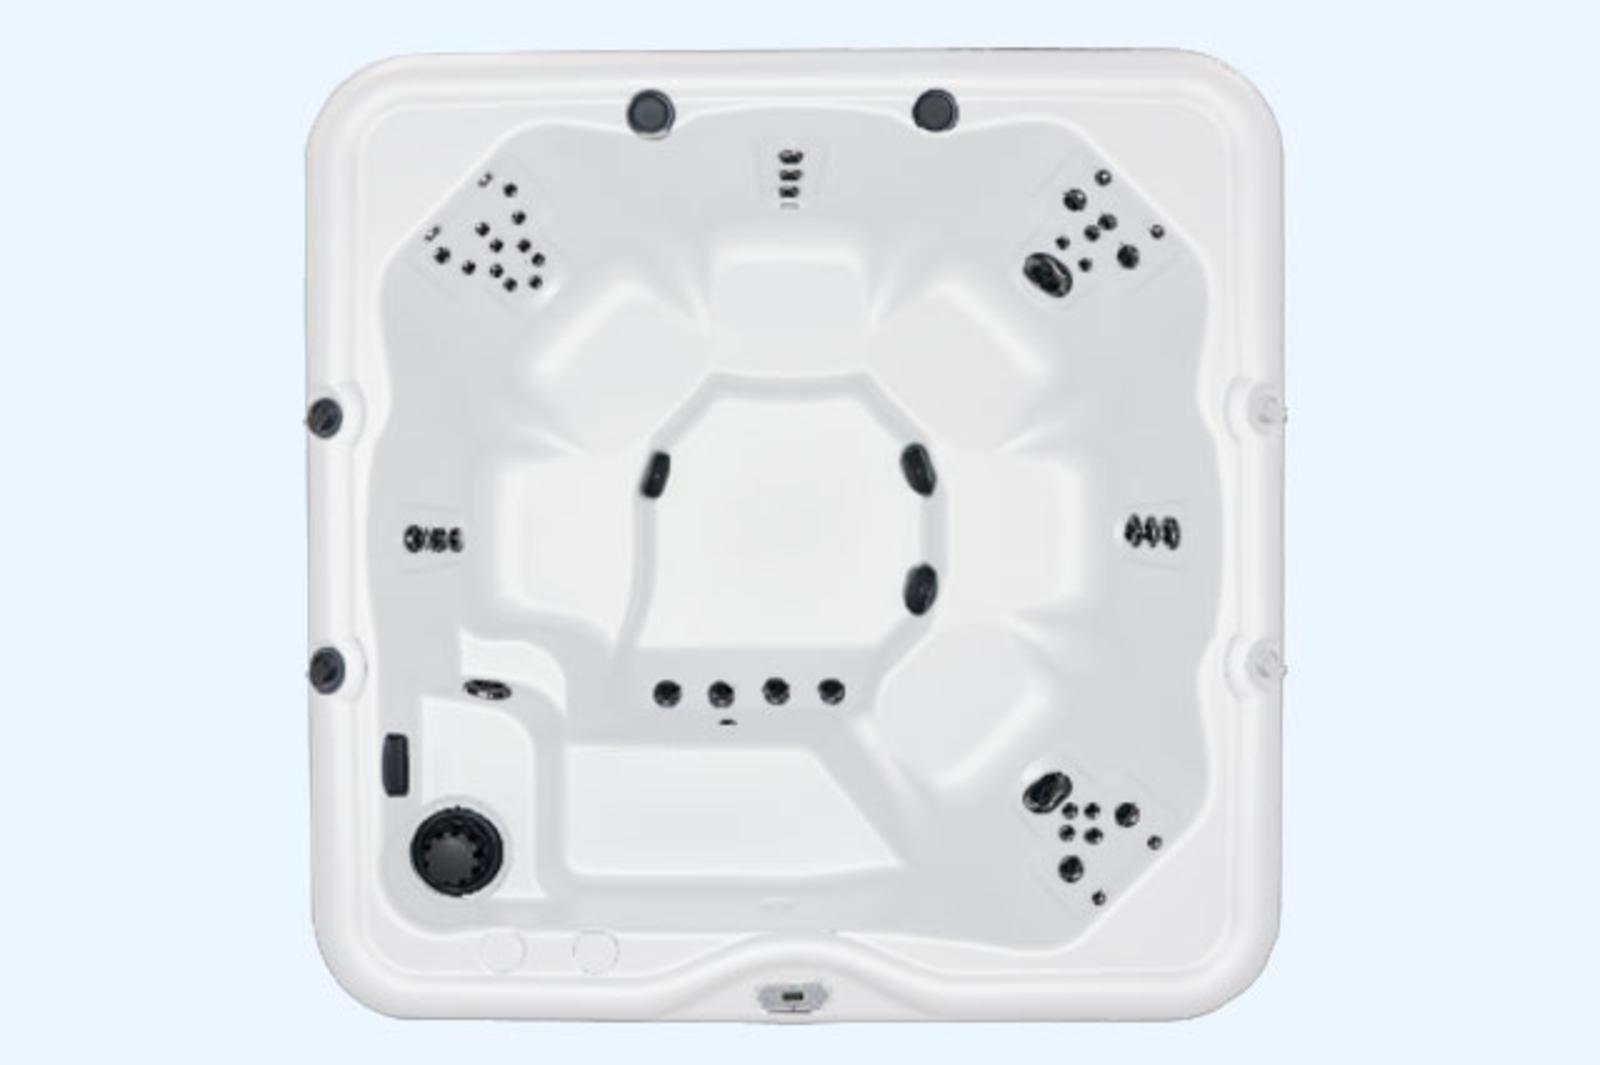 Hot Tub Luxury Jubilee